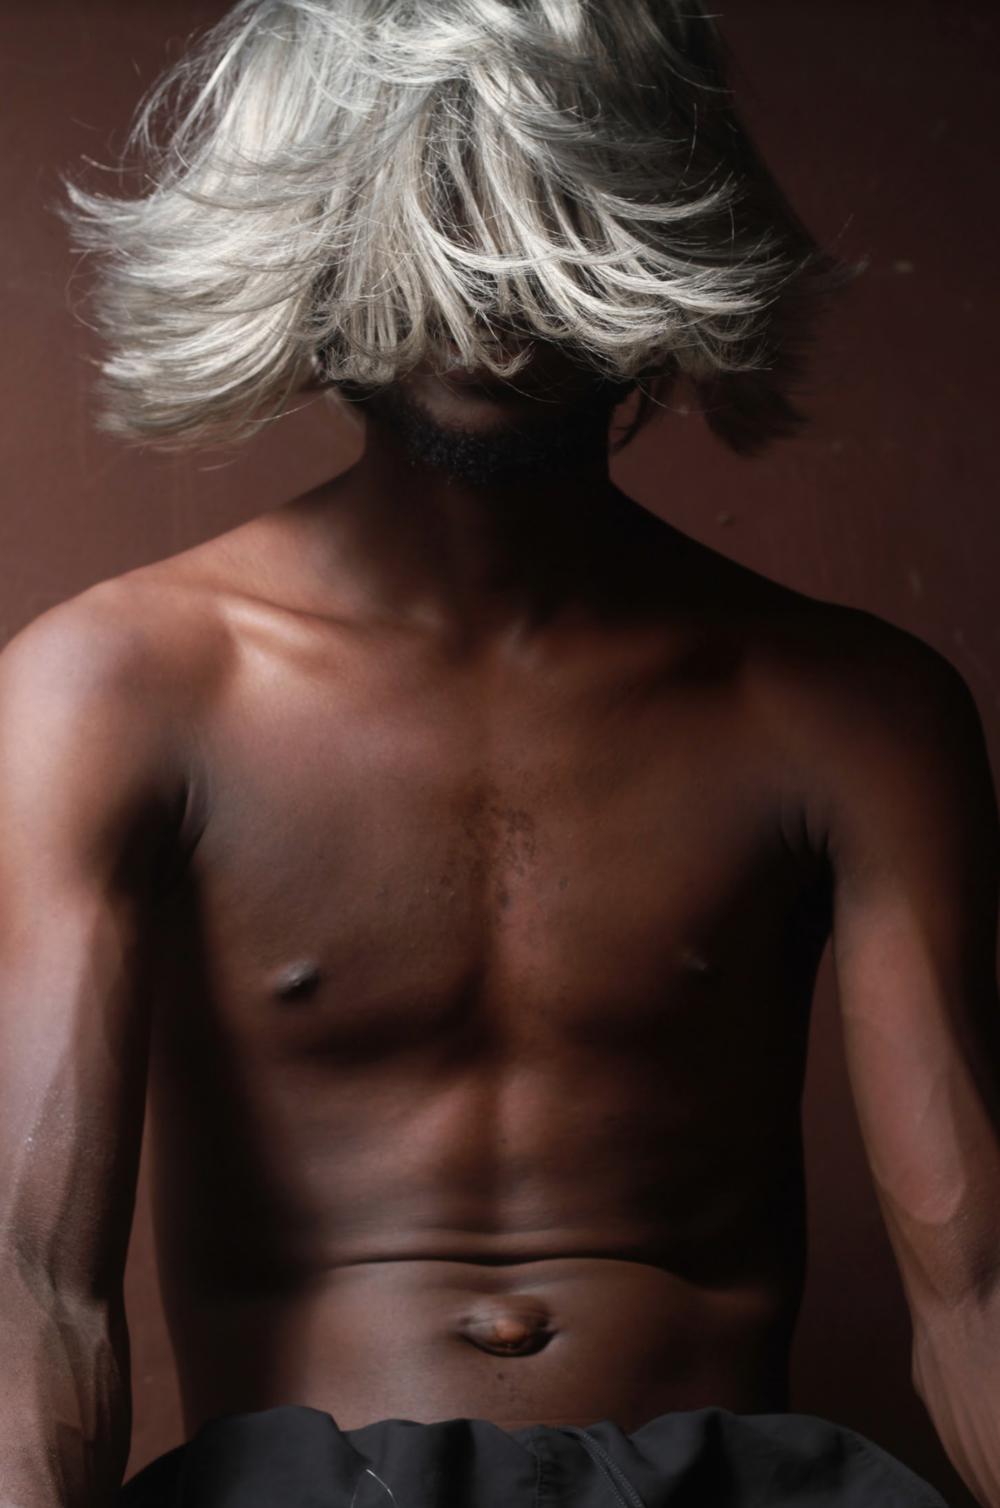 NOMA OSULA - Vice Photo Issue